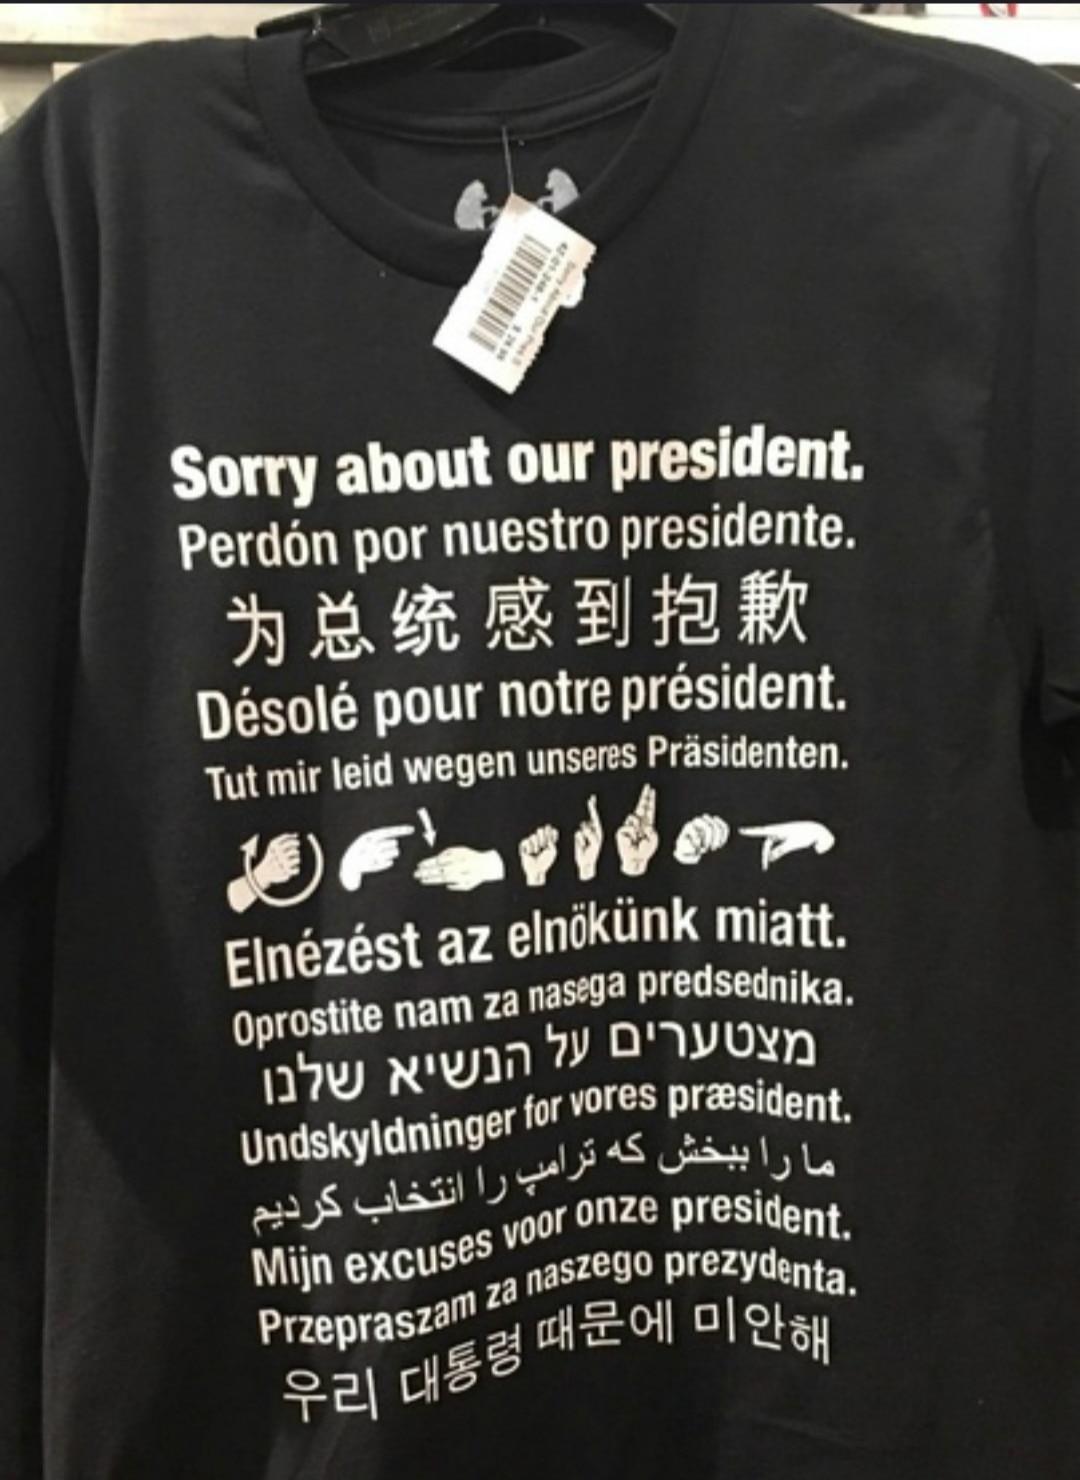 Hilbilly Sorry About Our President многоязычные лозунги унисекс футболки для мужчин и женщин забавная летняя хлопковая Футболка для женщин